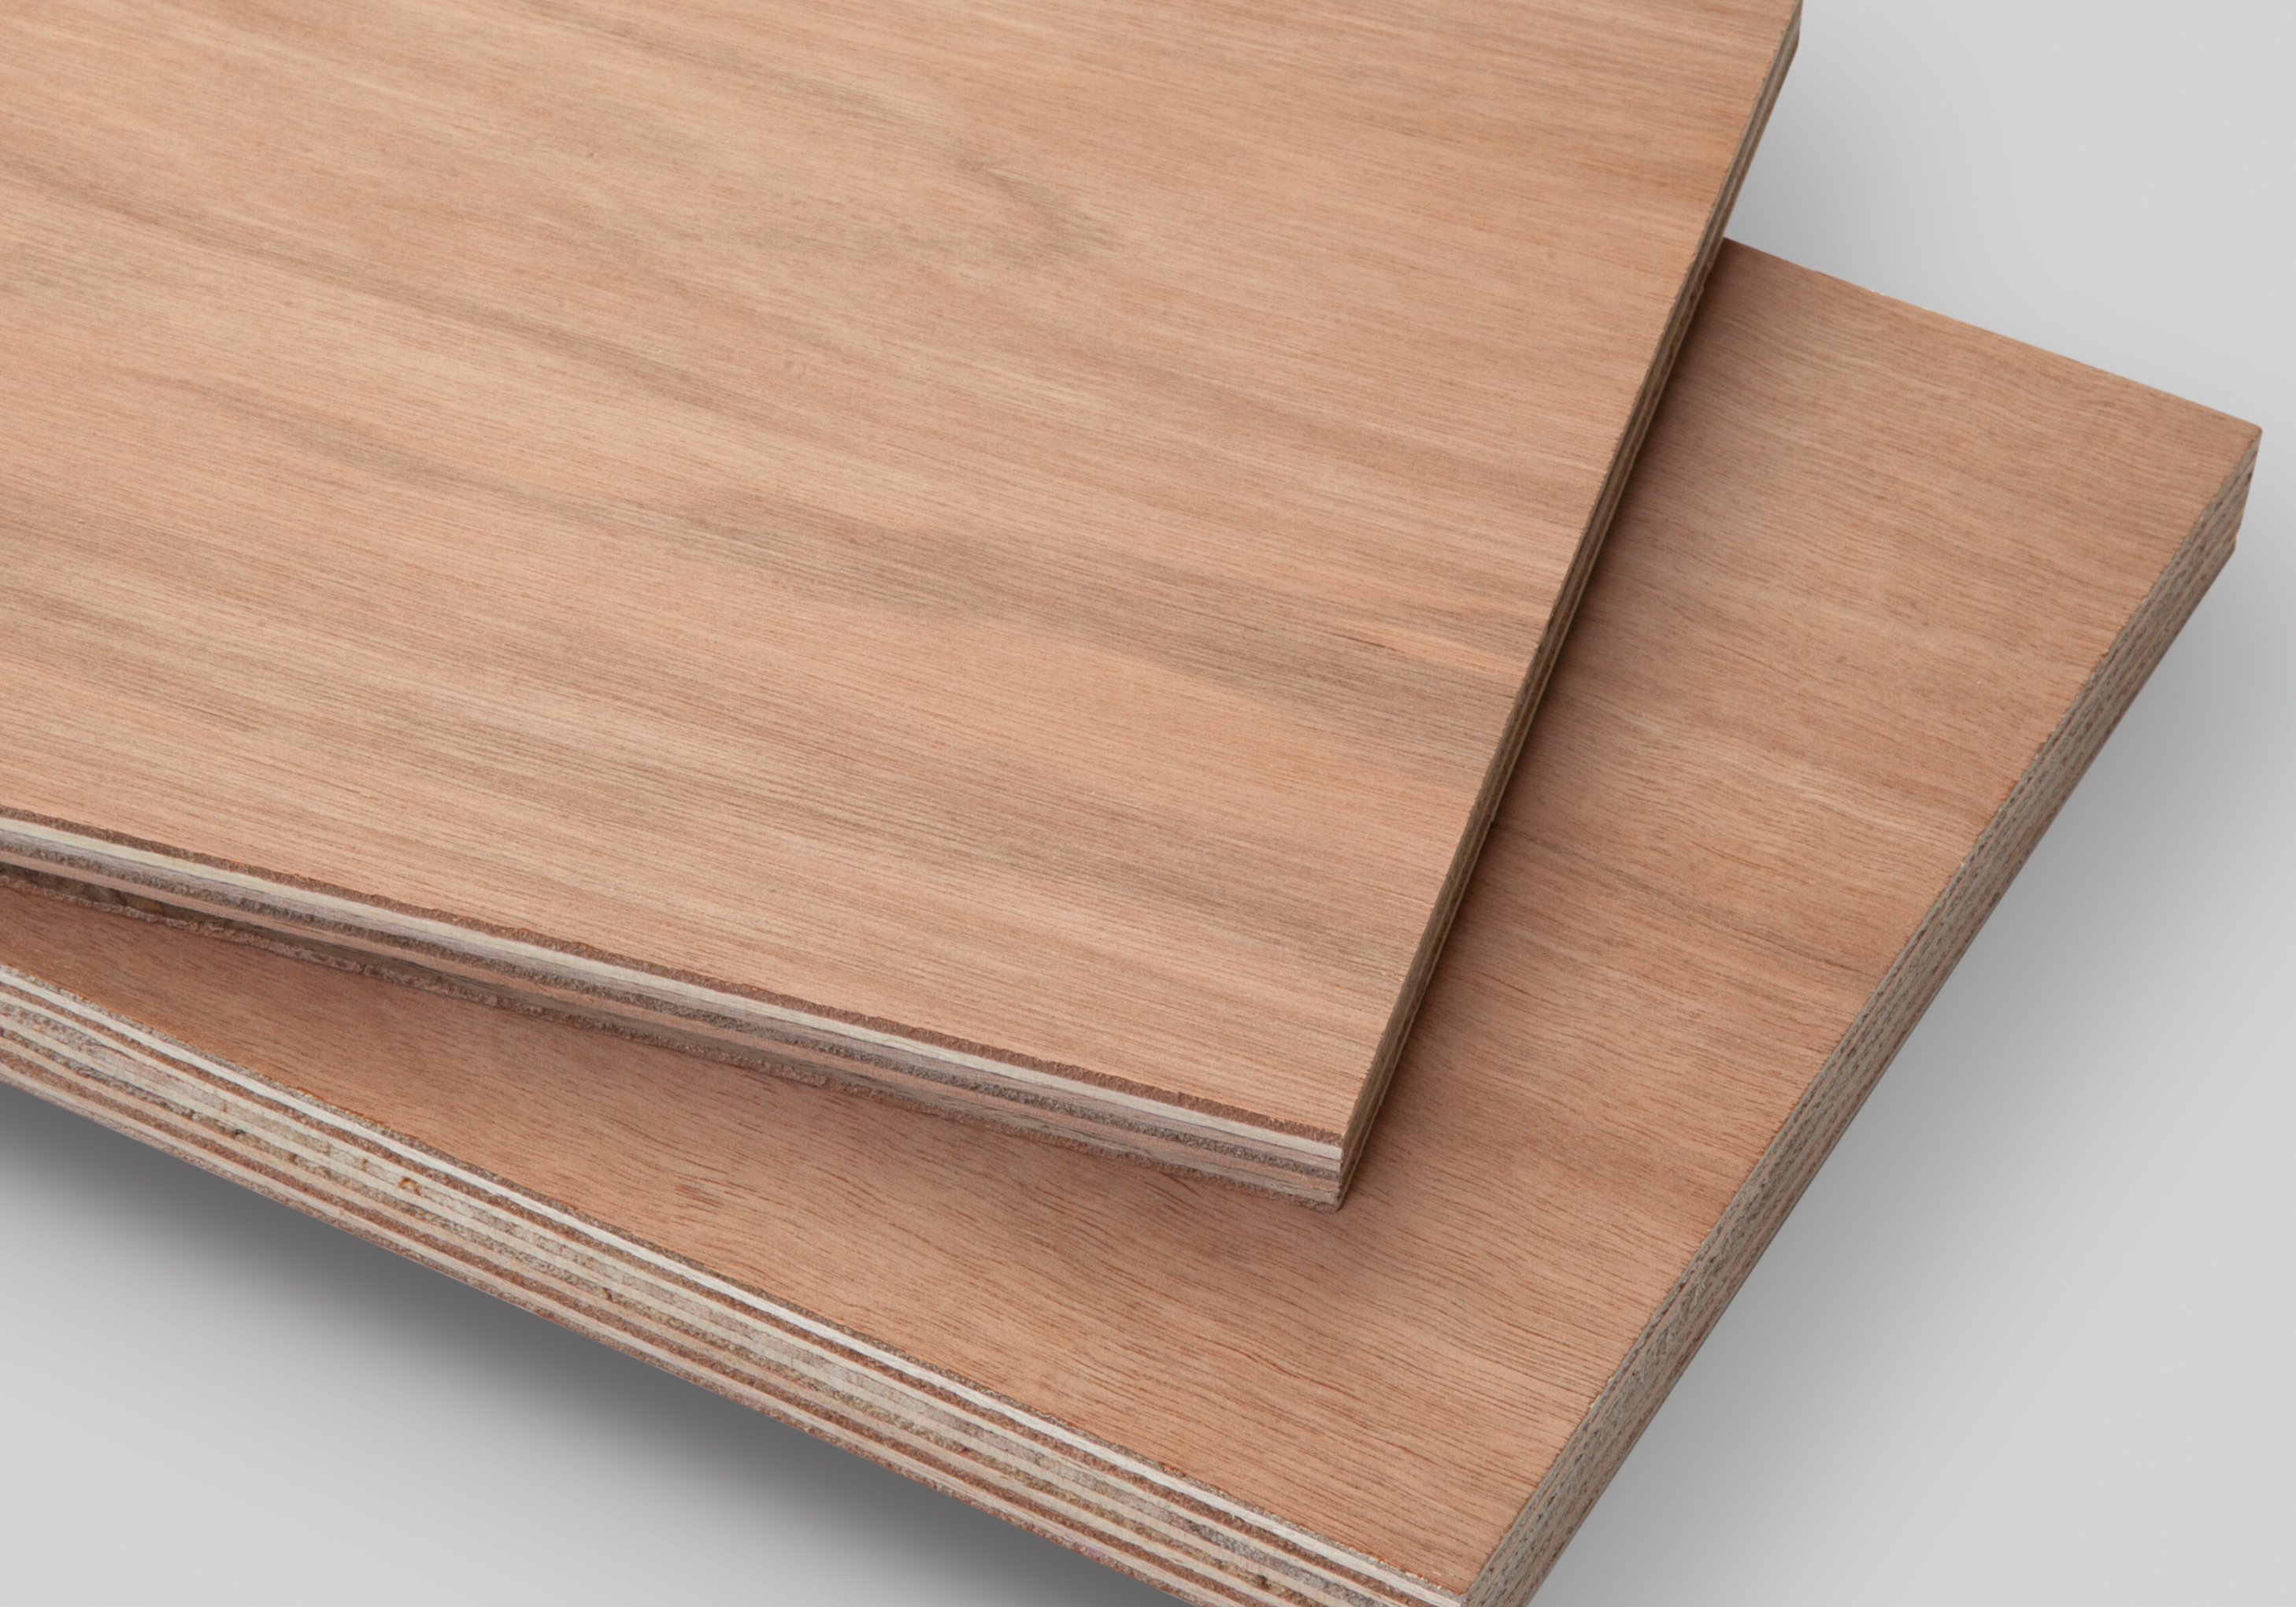 tropical hardwood plywood ORRNMLV